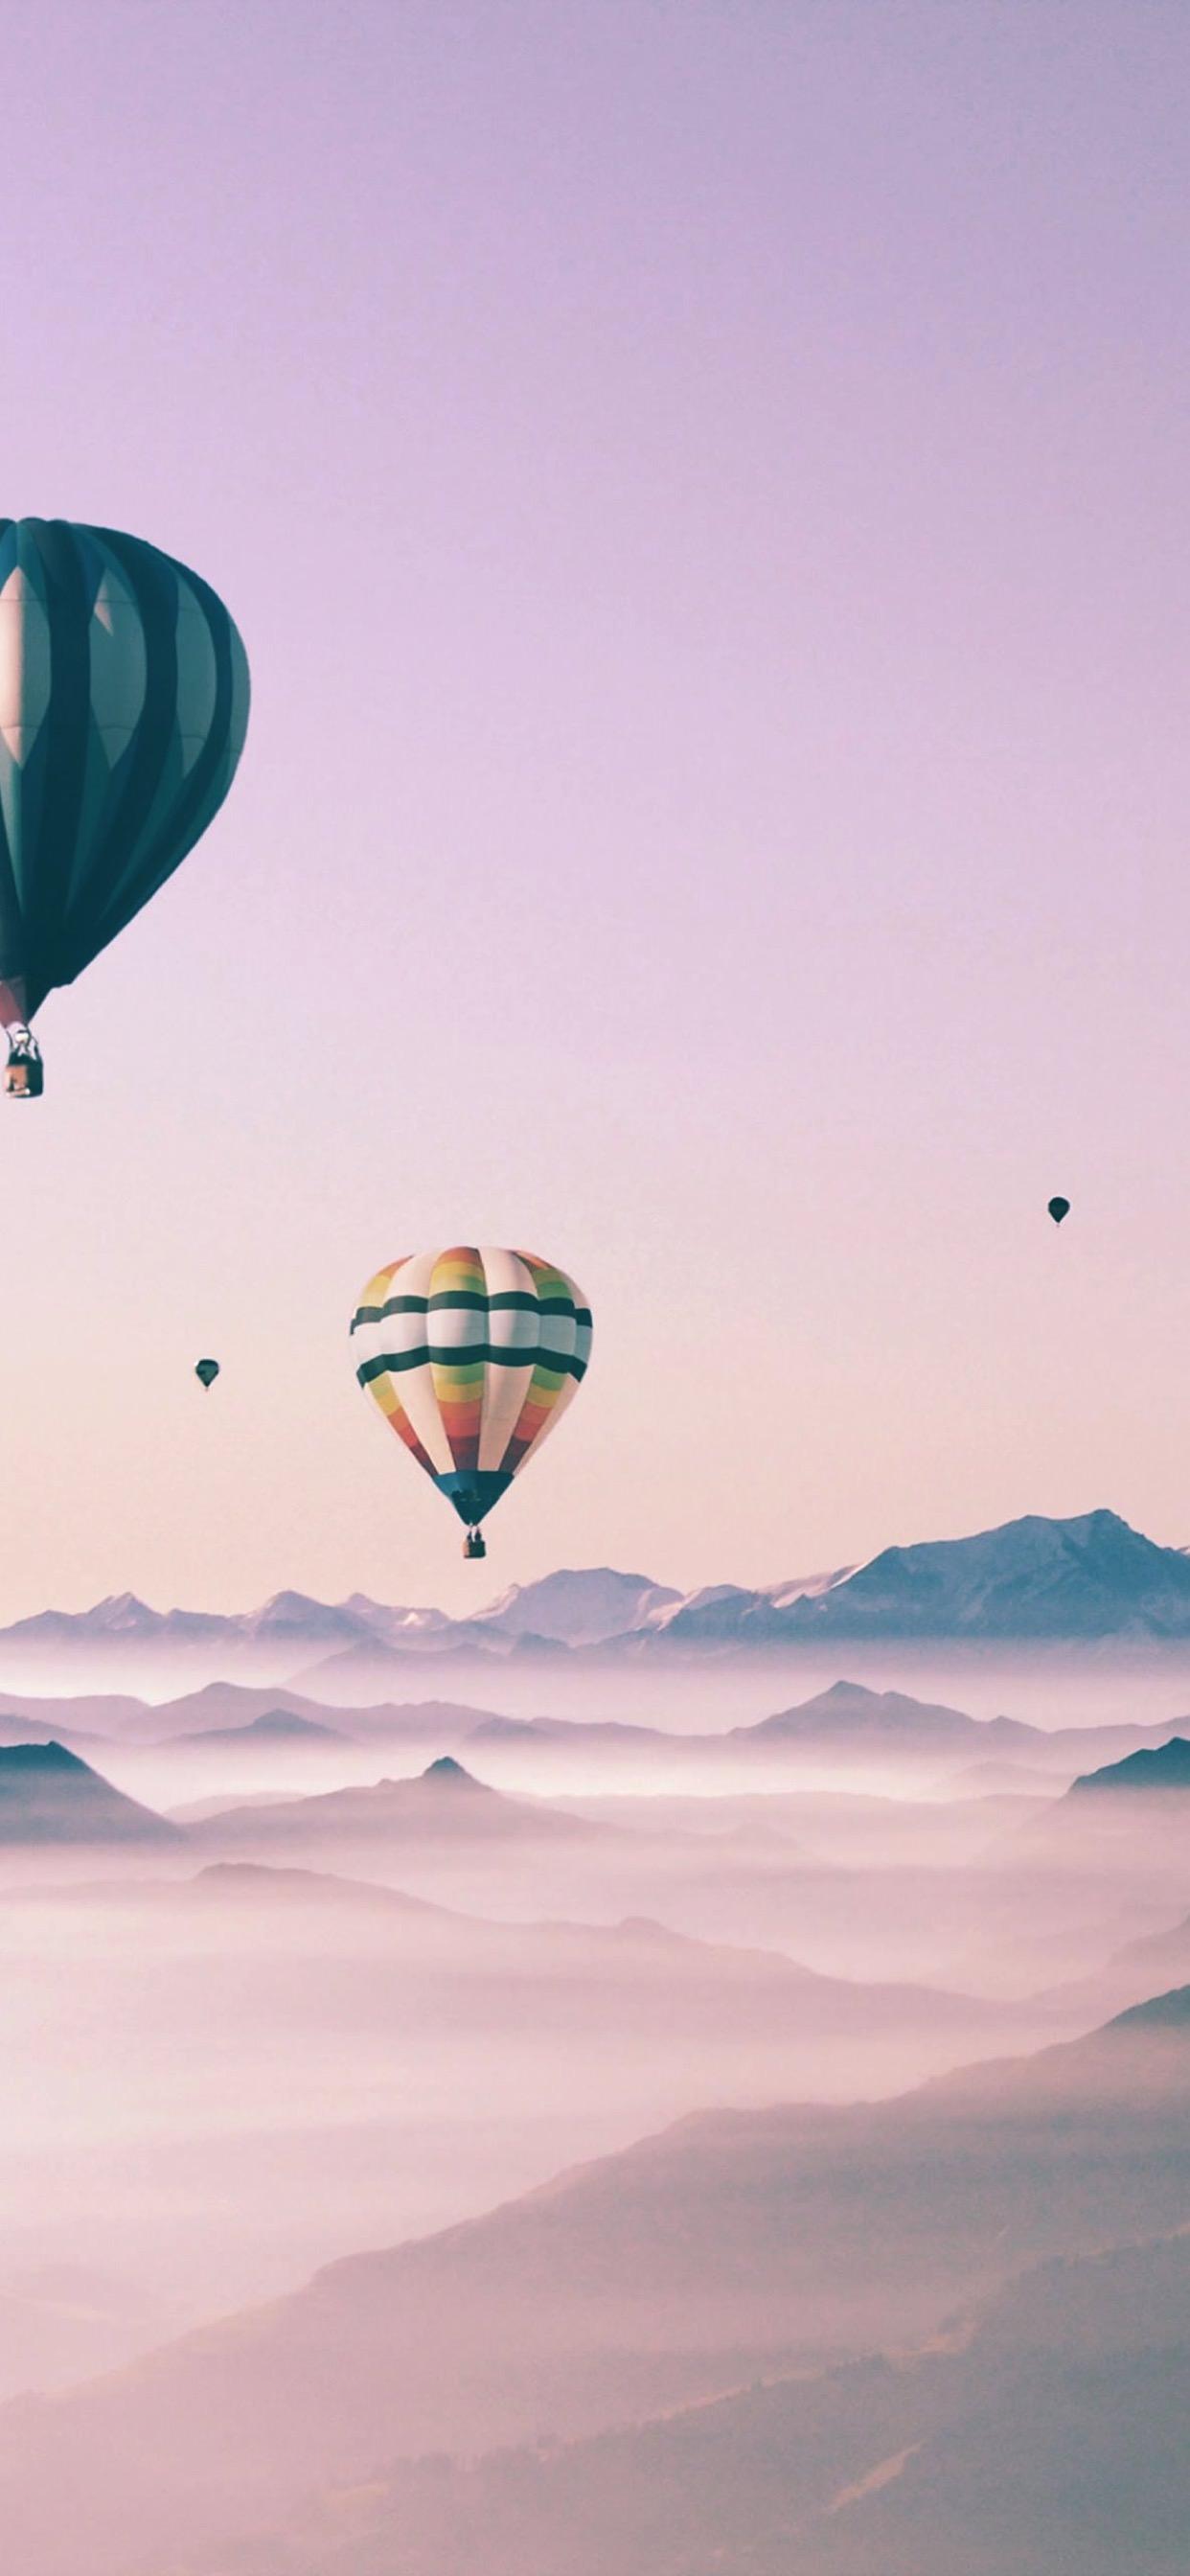 Cute Landscape Sky Balloon For Girls Wallpaper Sc Iphone